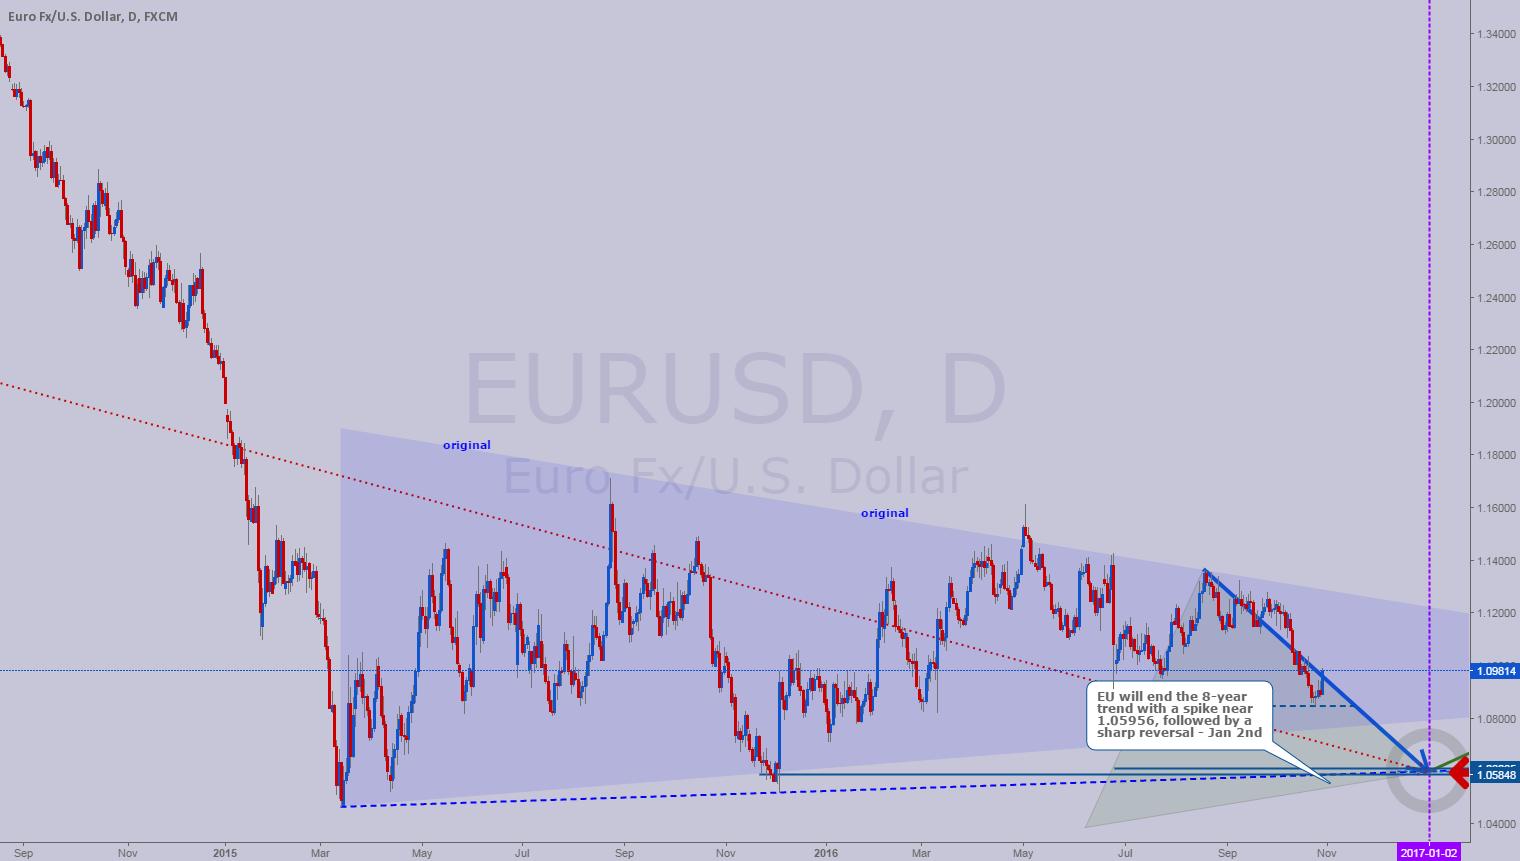 EU to reverse in MAJOR trend shift